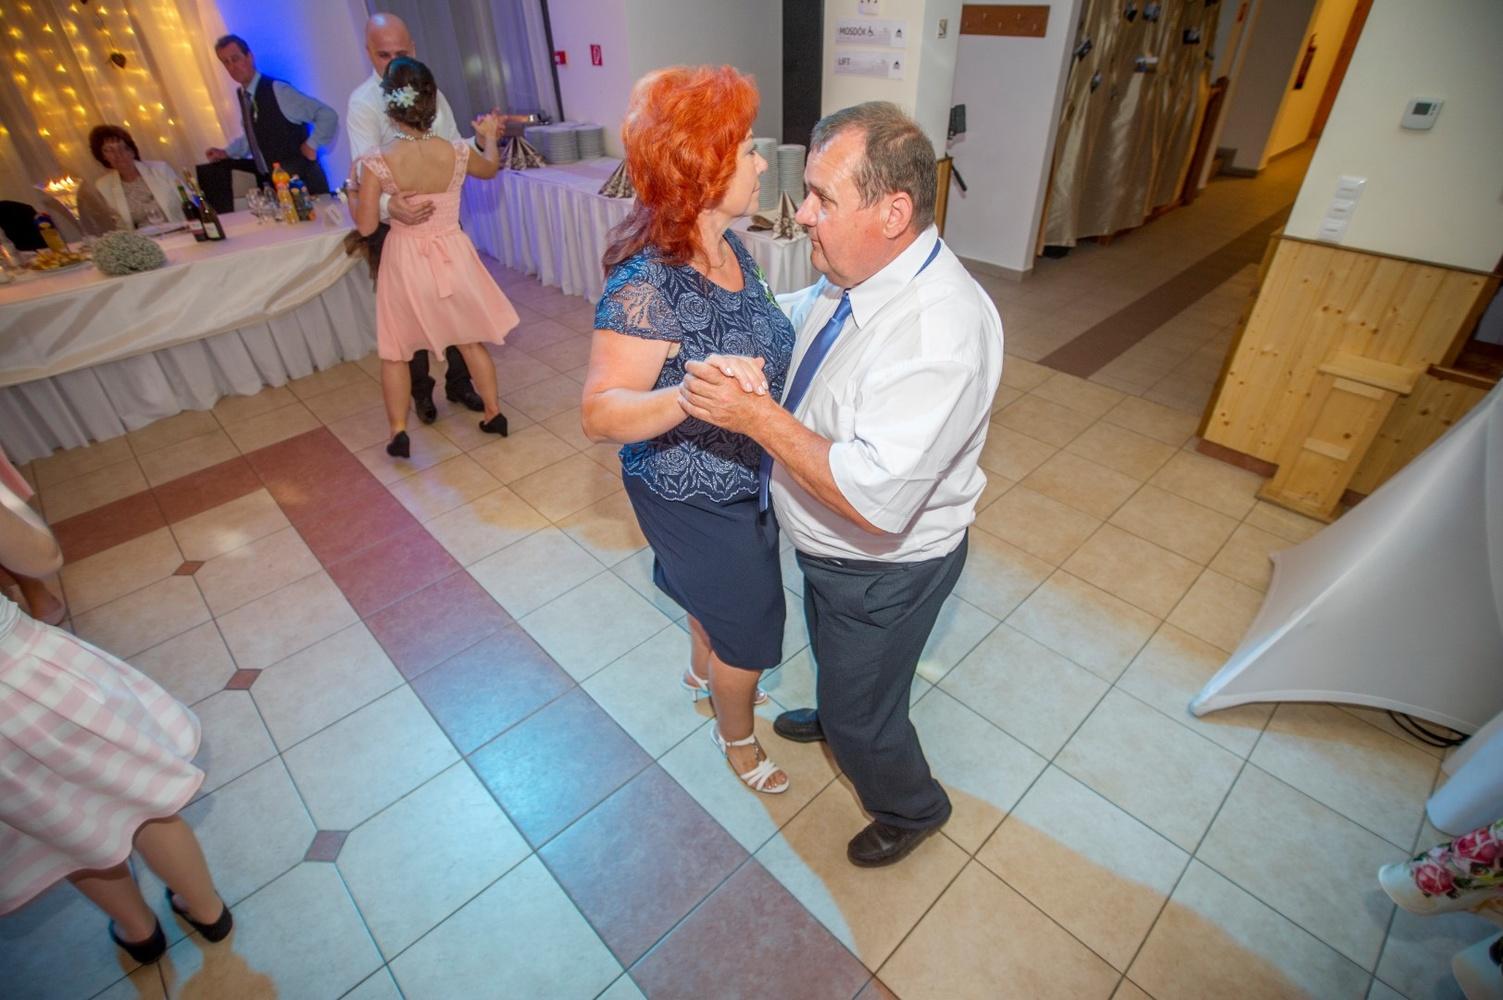 http://www.fotoz.sk/images/gallery-18/normal/eskuvo-fotozas_svadobne-fotenie_580.jpg